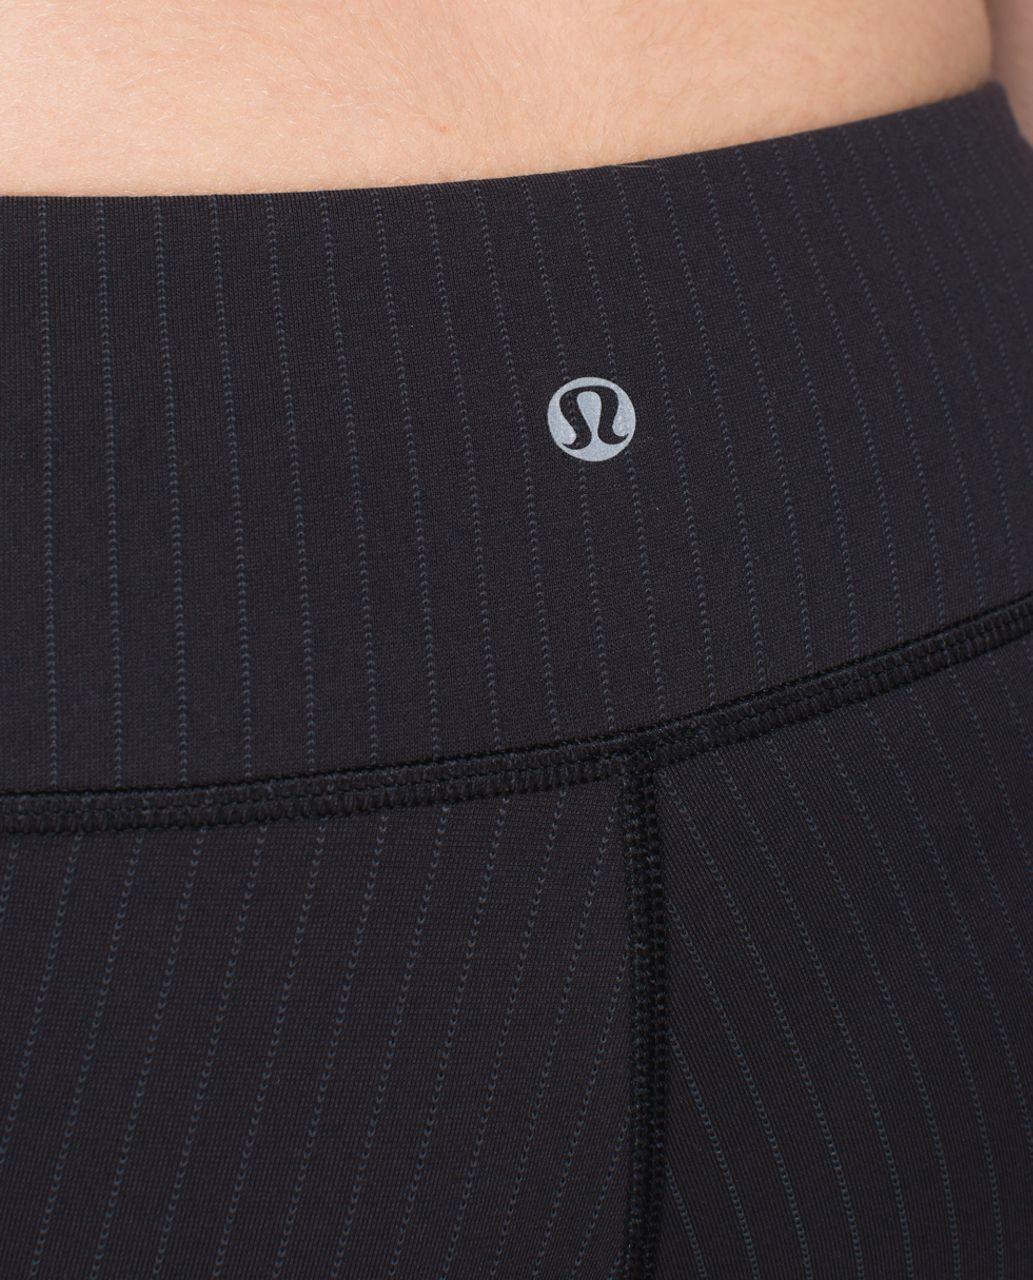 Lululemon Wunder Under Pant *Full-On Luon (Print) - Conductor Stripe Black Deep Coal